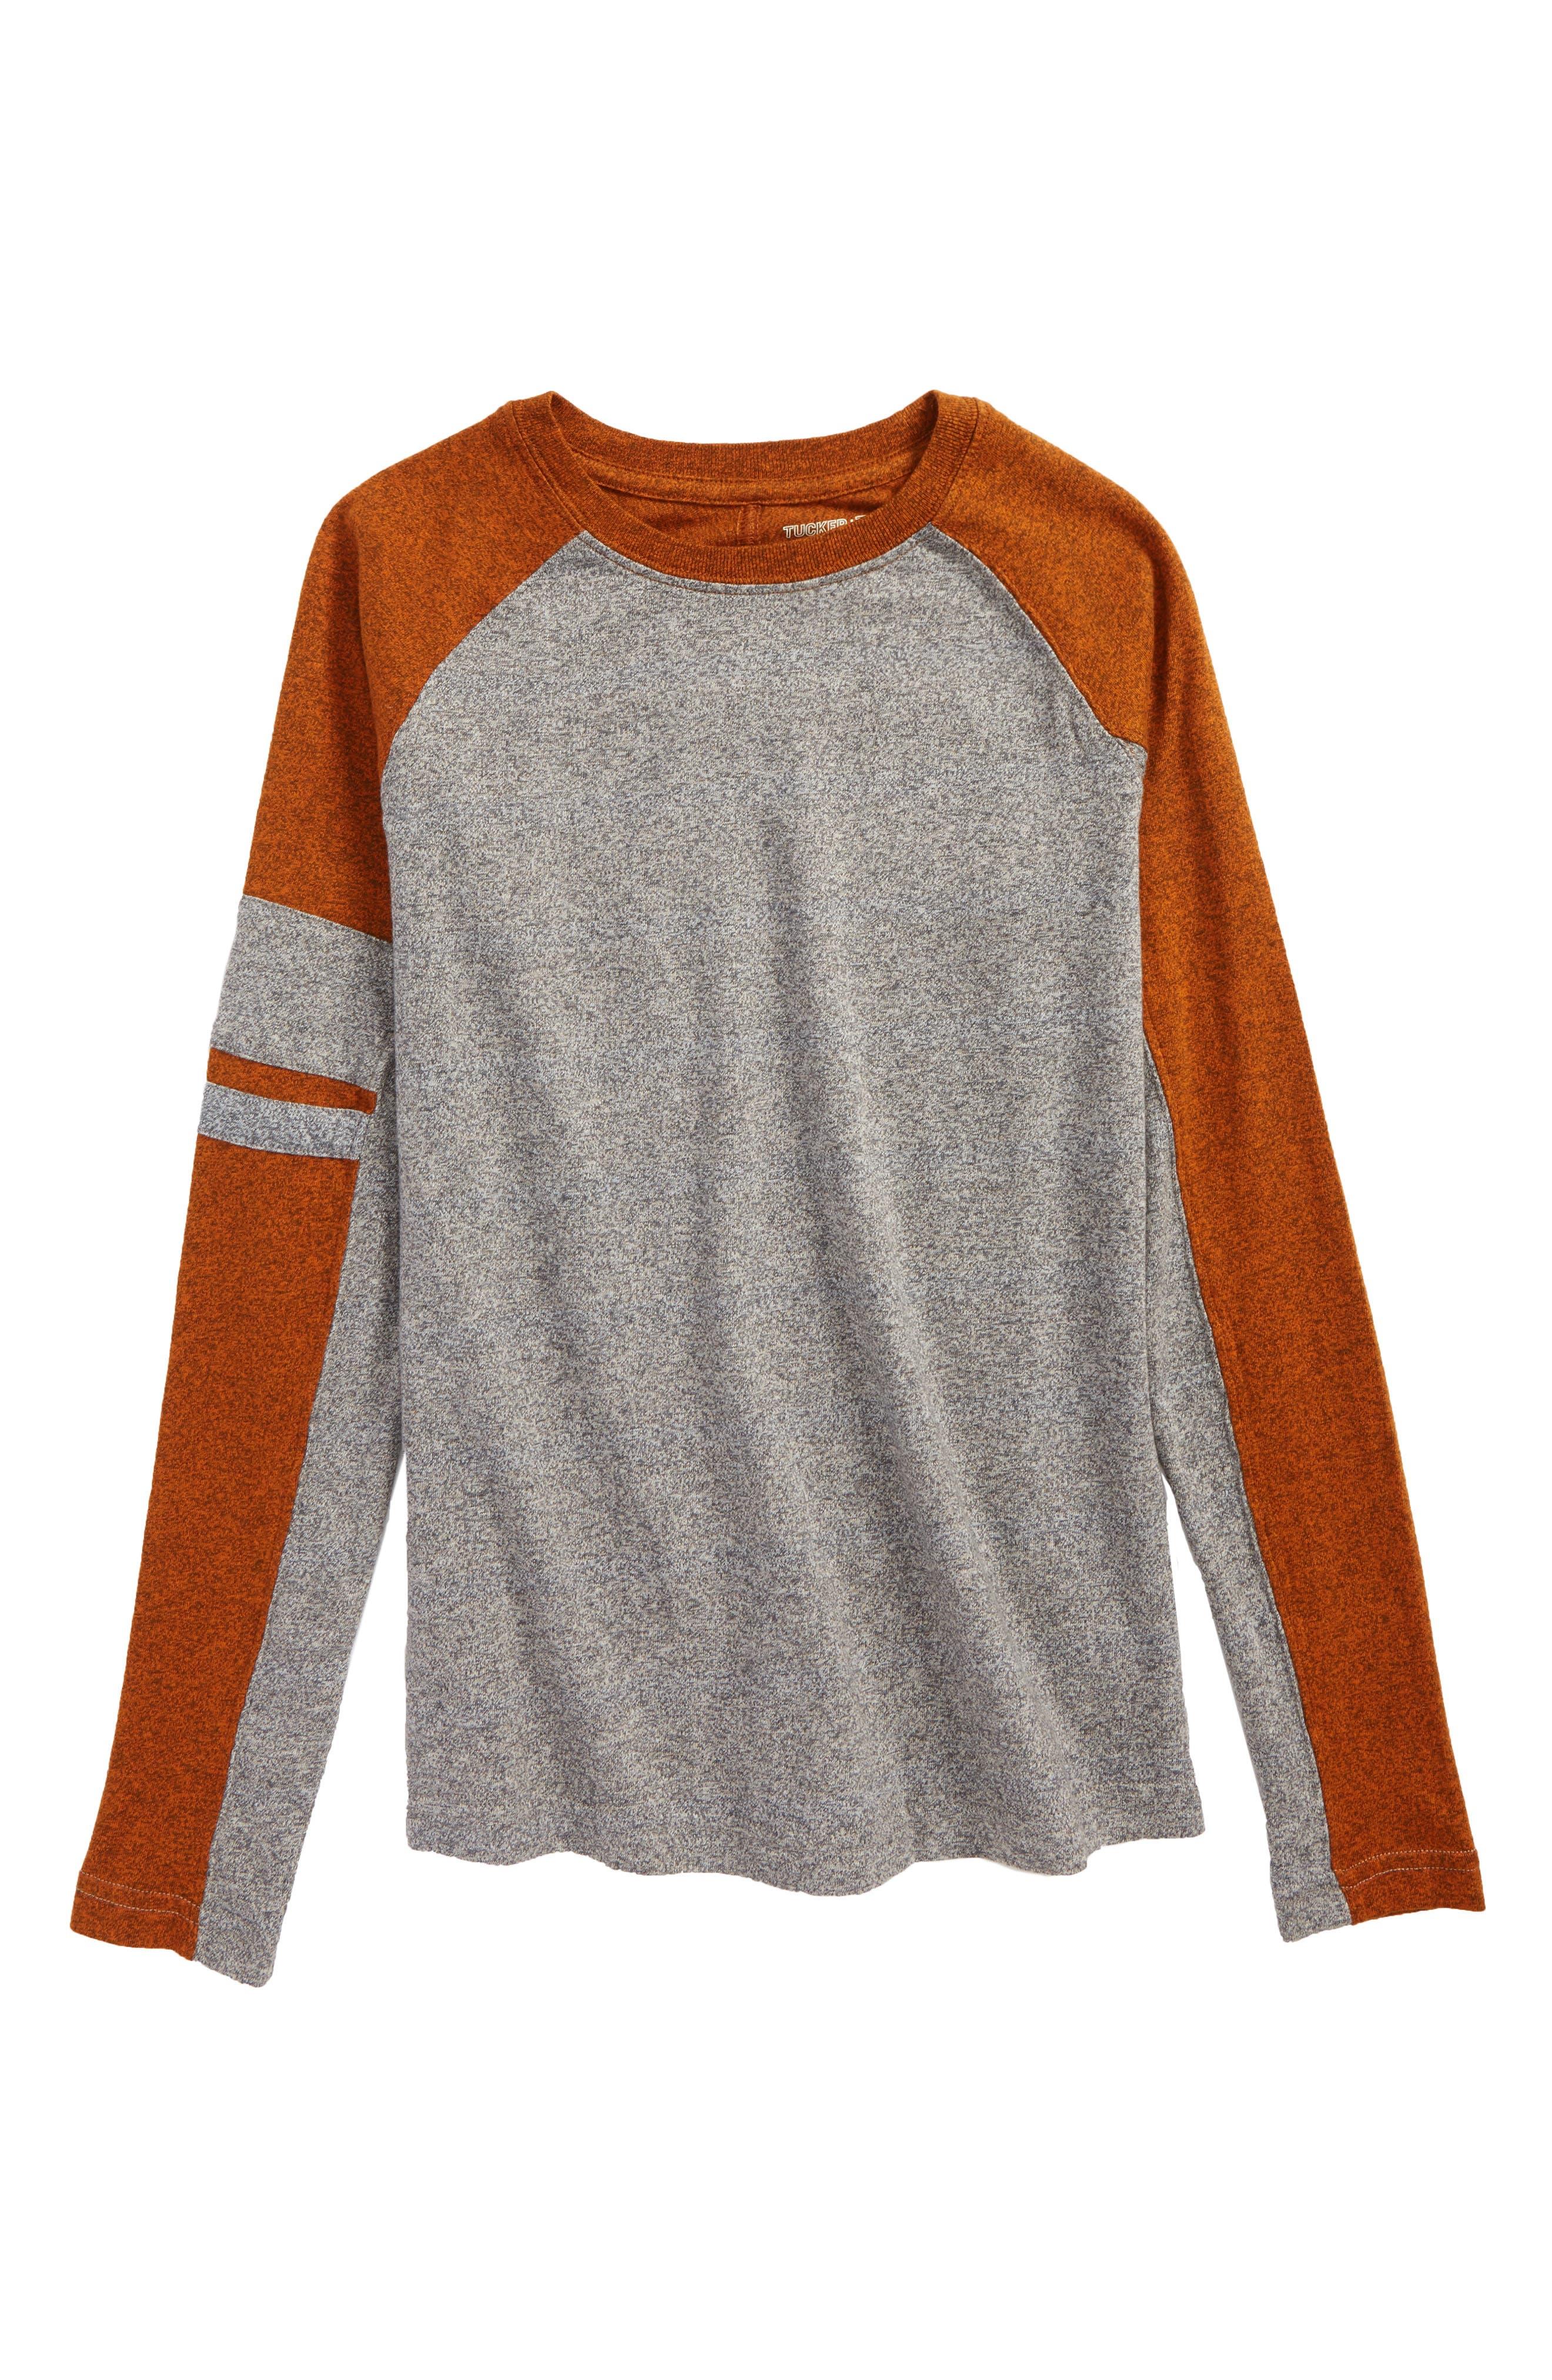 Alternate Image 1 Selected - Tucker + Tate Varsity Raglan Shirt (Big Boys)